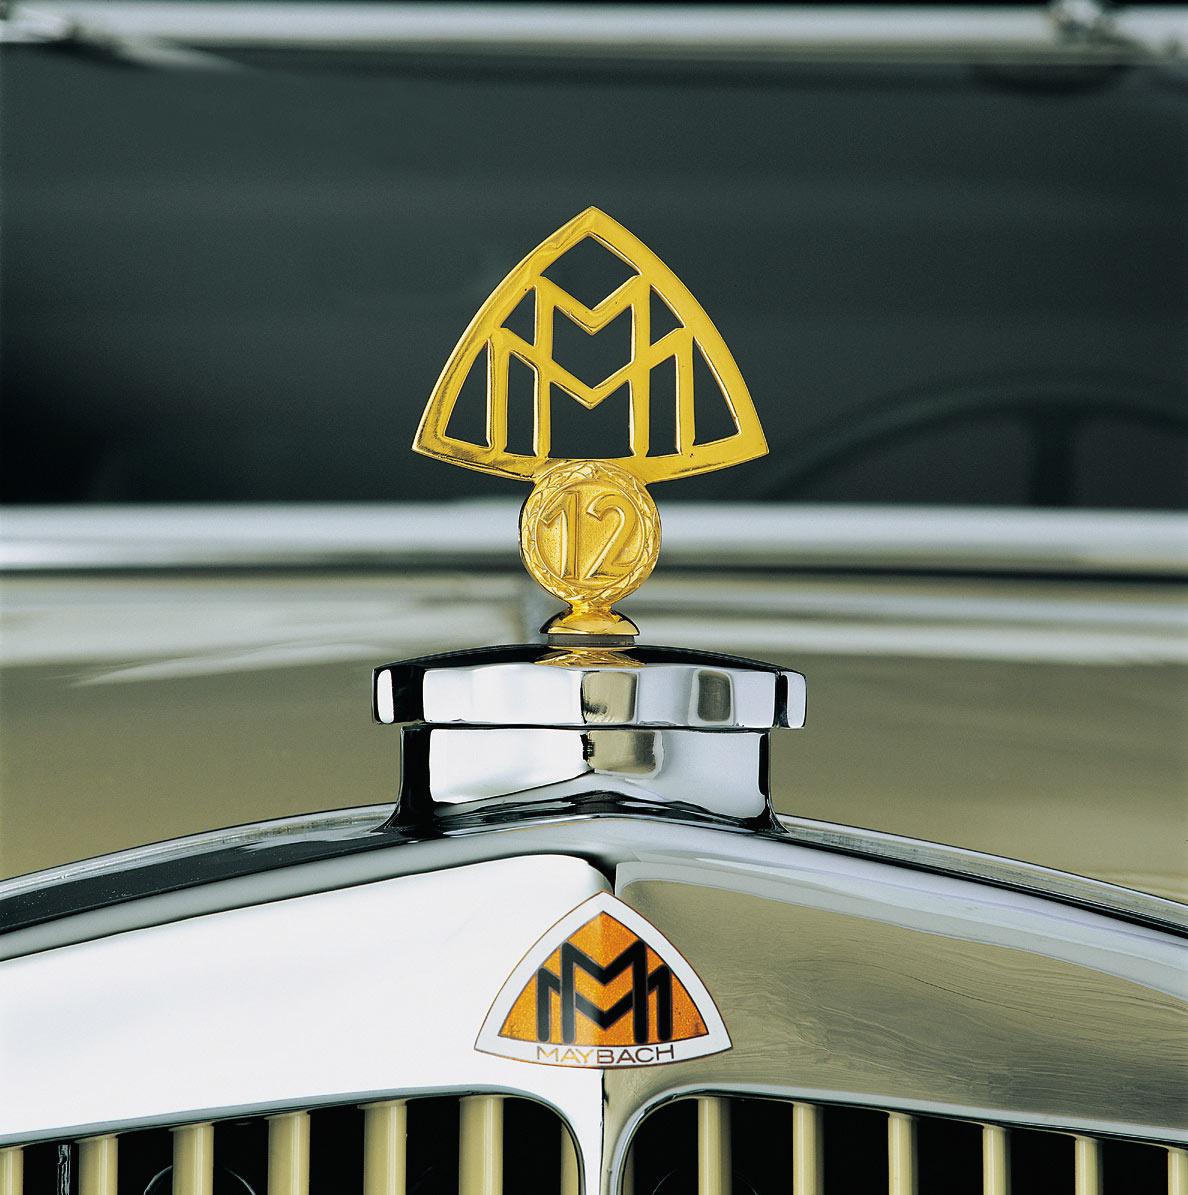 #47, Maybach, Horch, Luxuslimousine, Mercedes-Benz